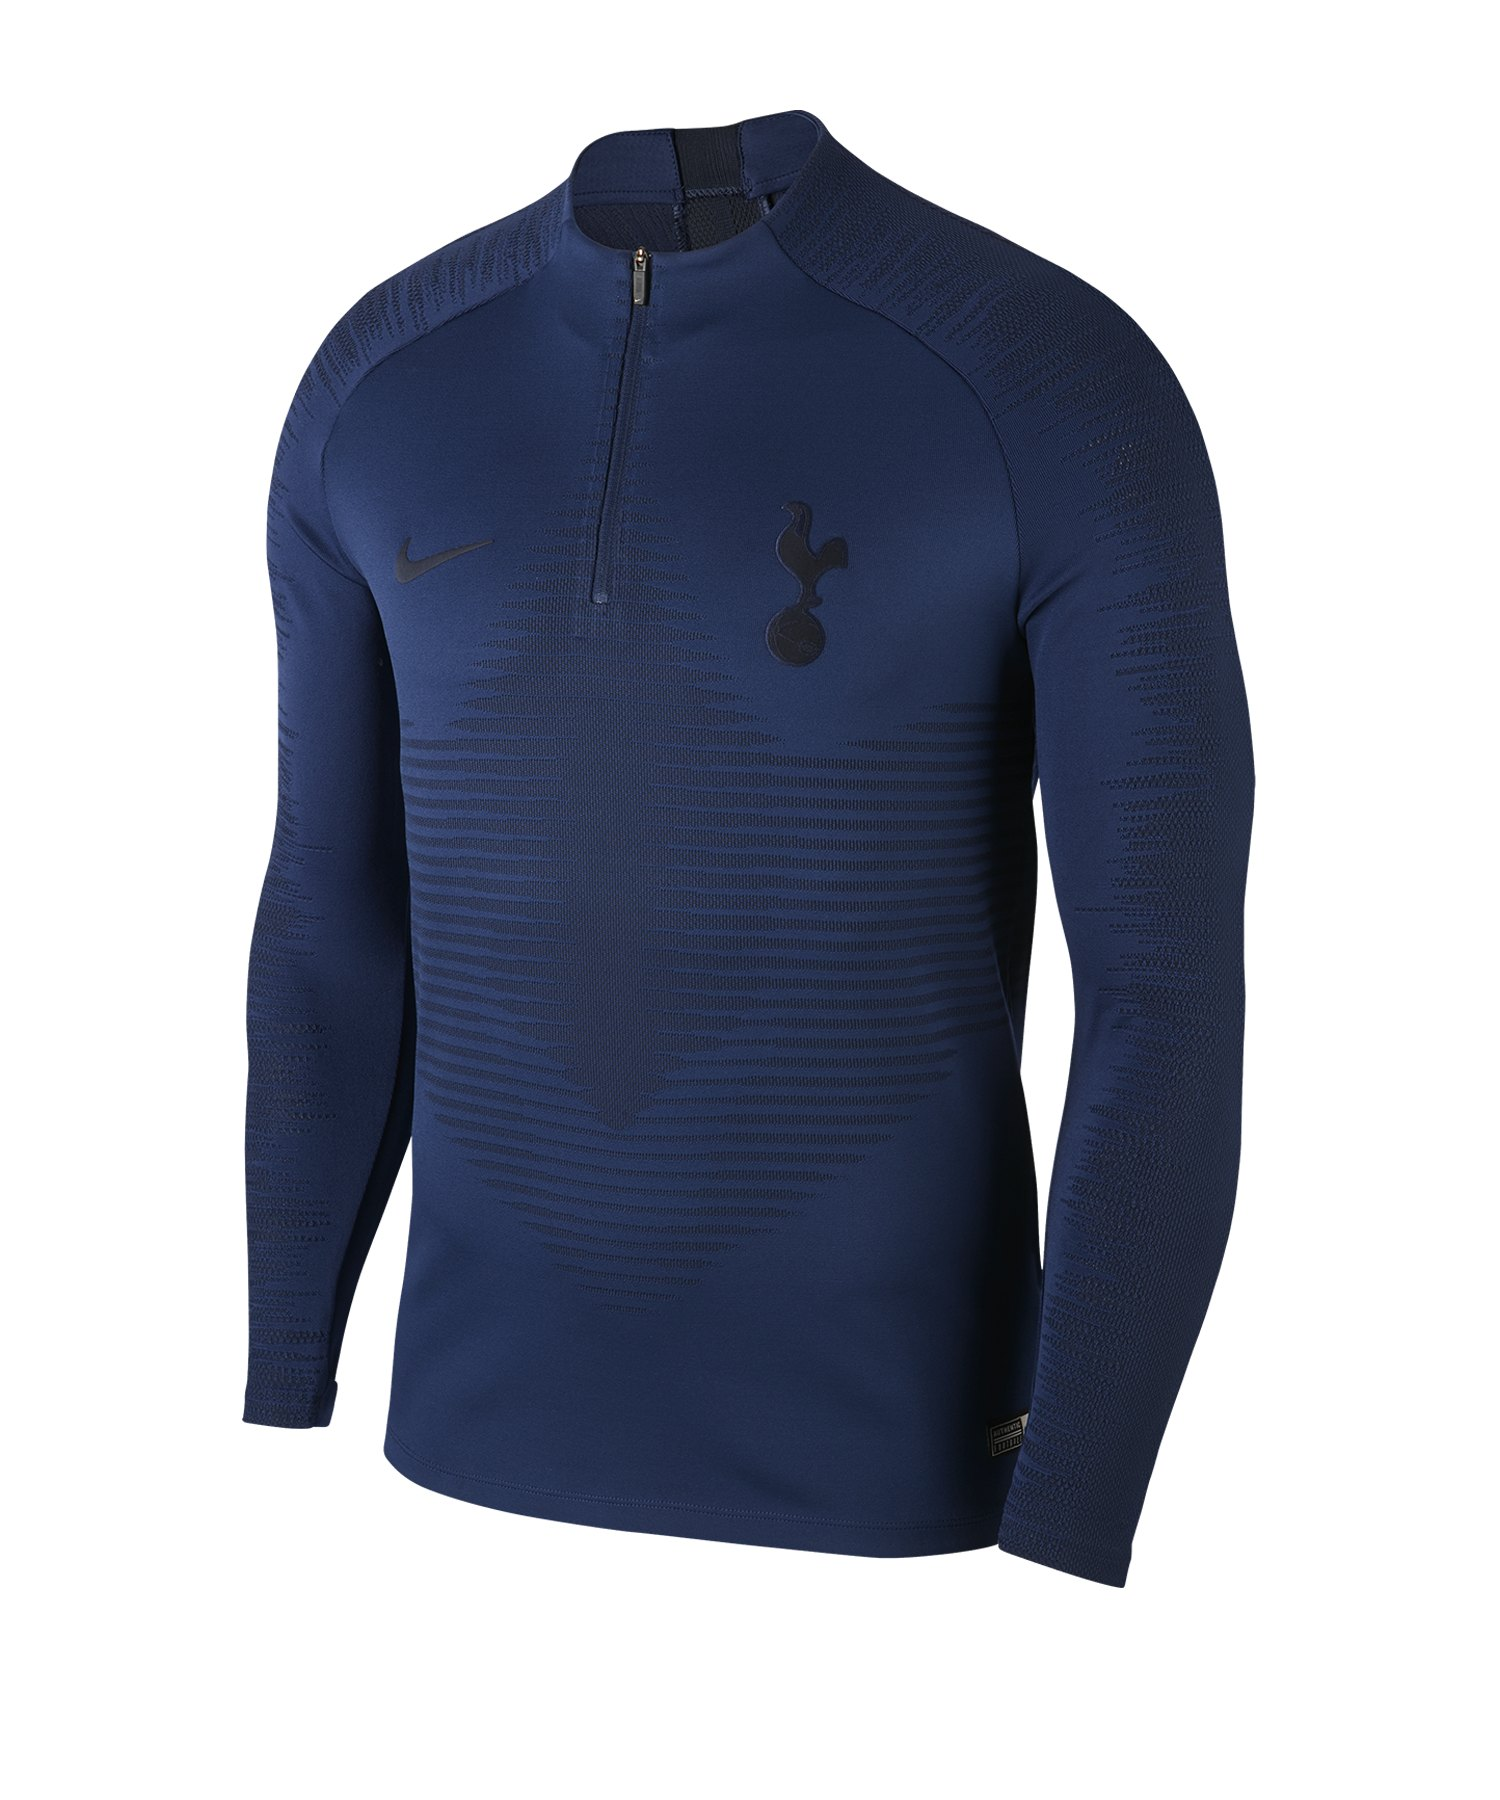 Nike Tottenham Hotspur Strike Drill Top Blau F430 - blau